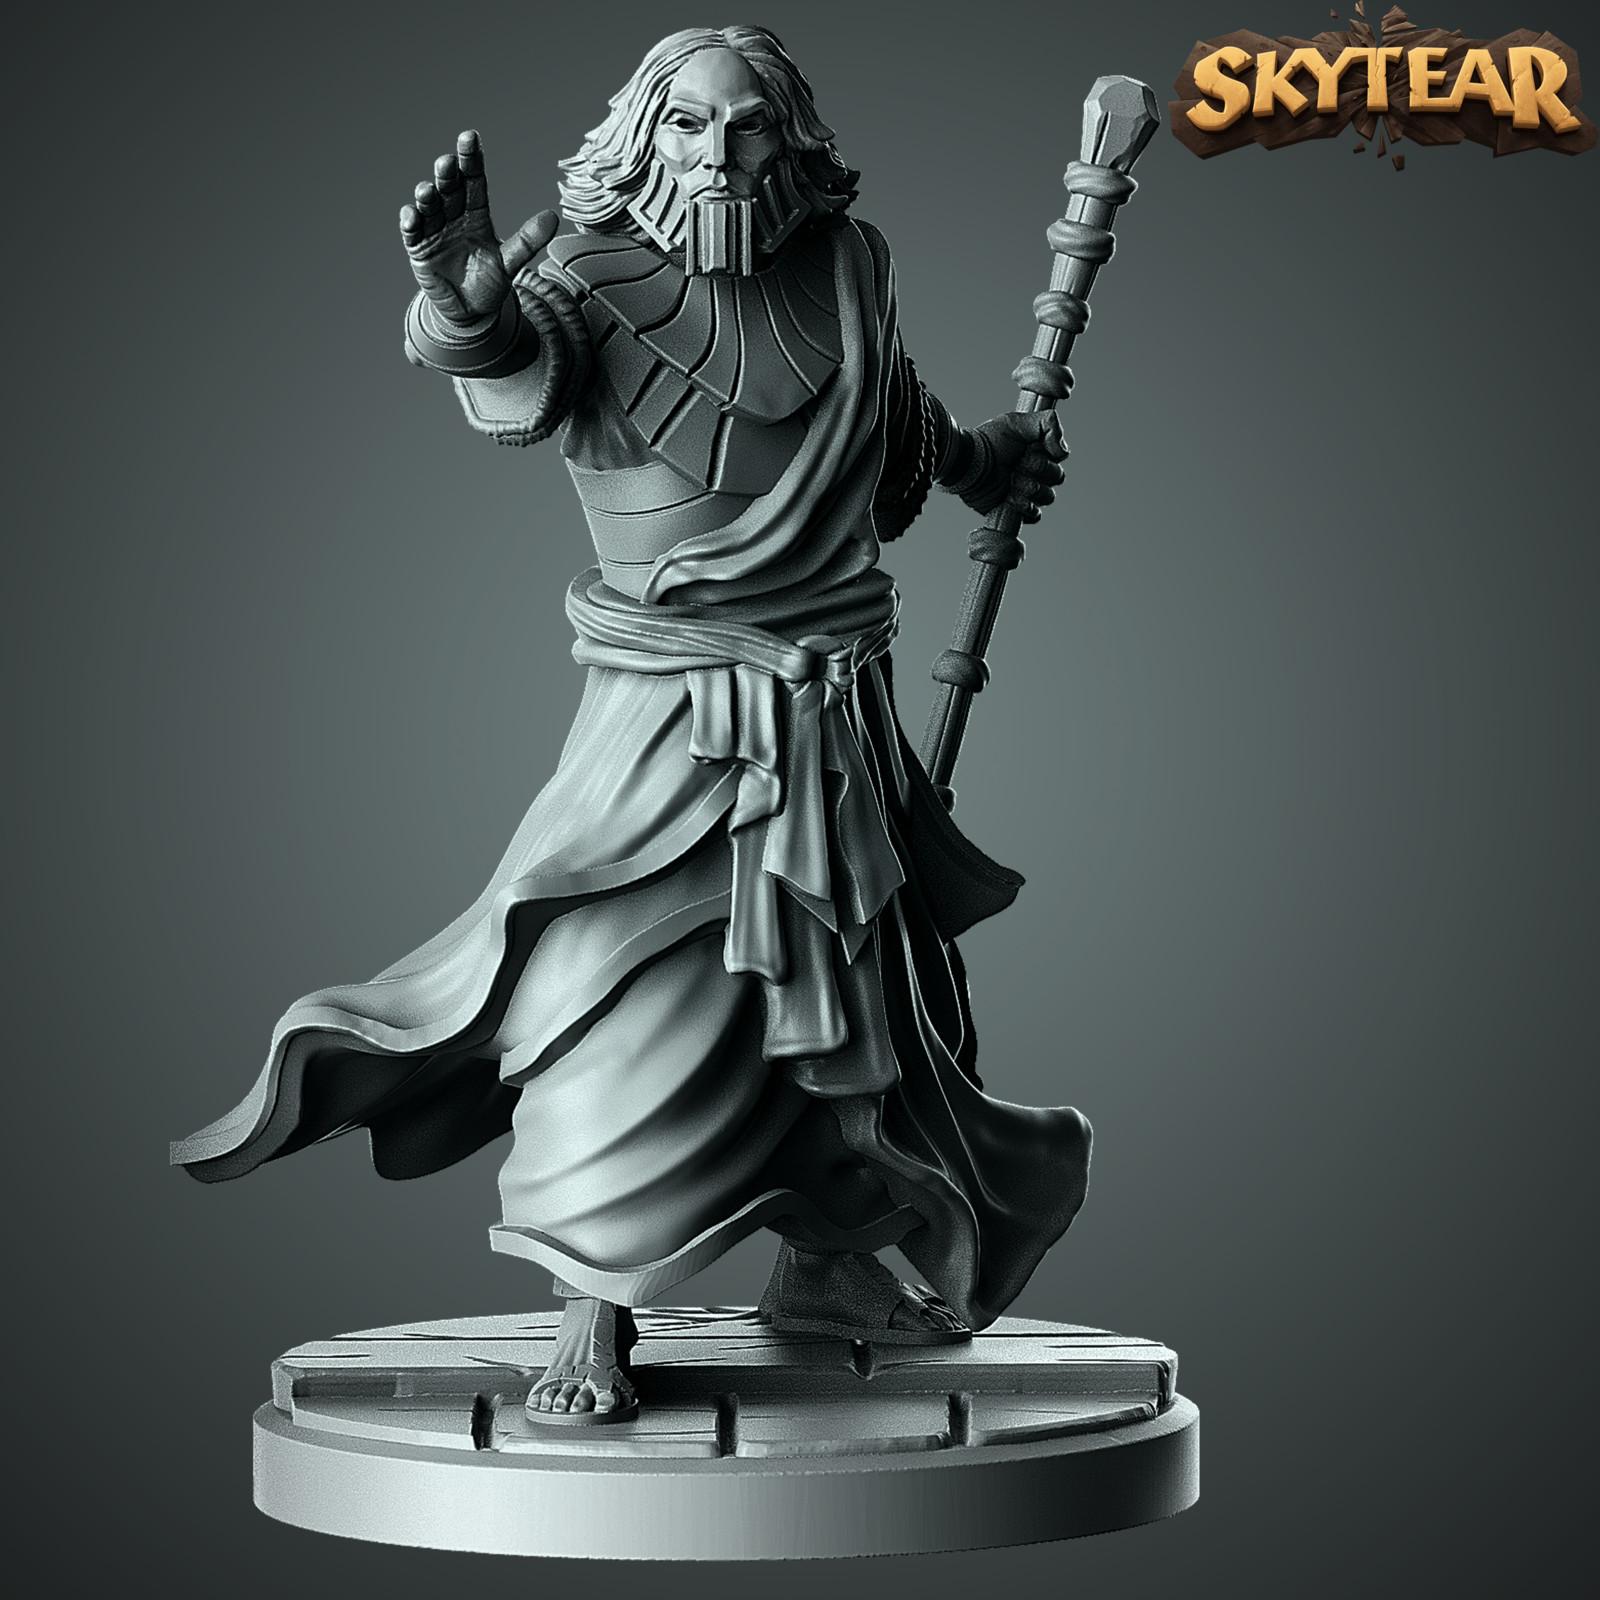 Skytear board game miniatures - Setheru